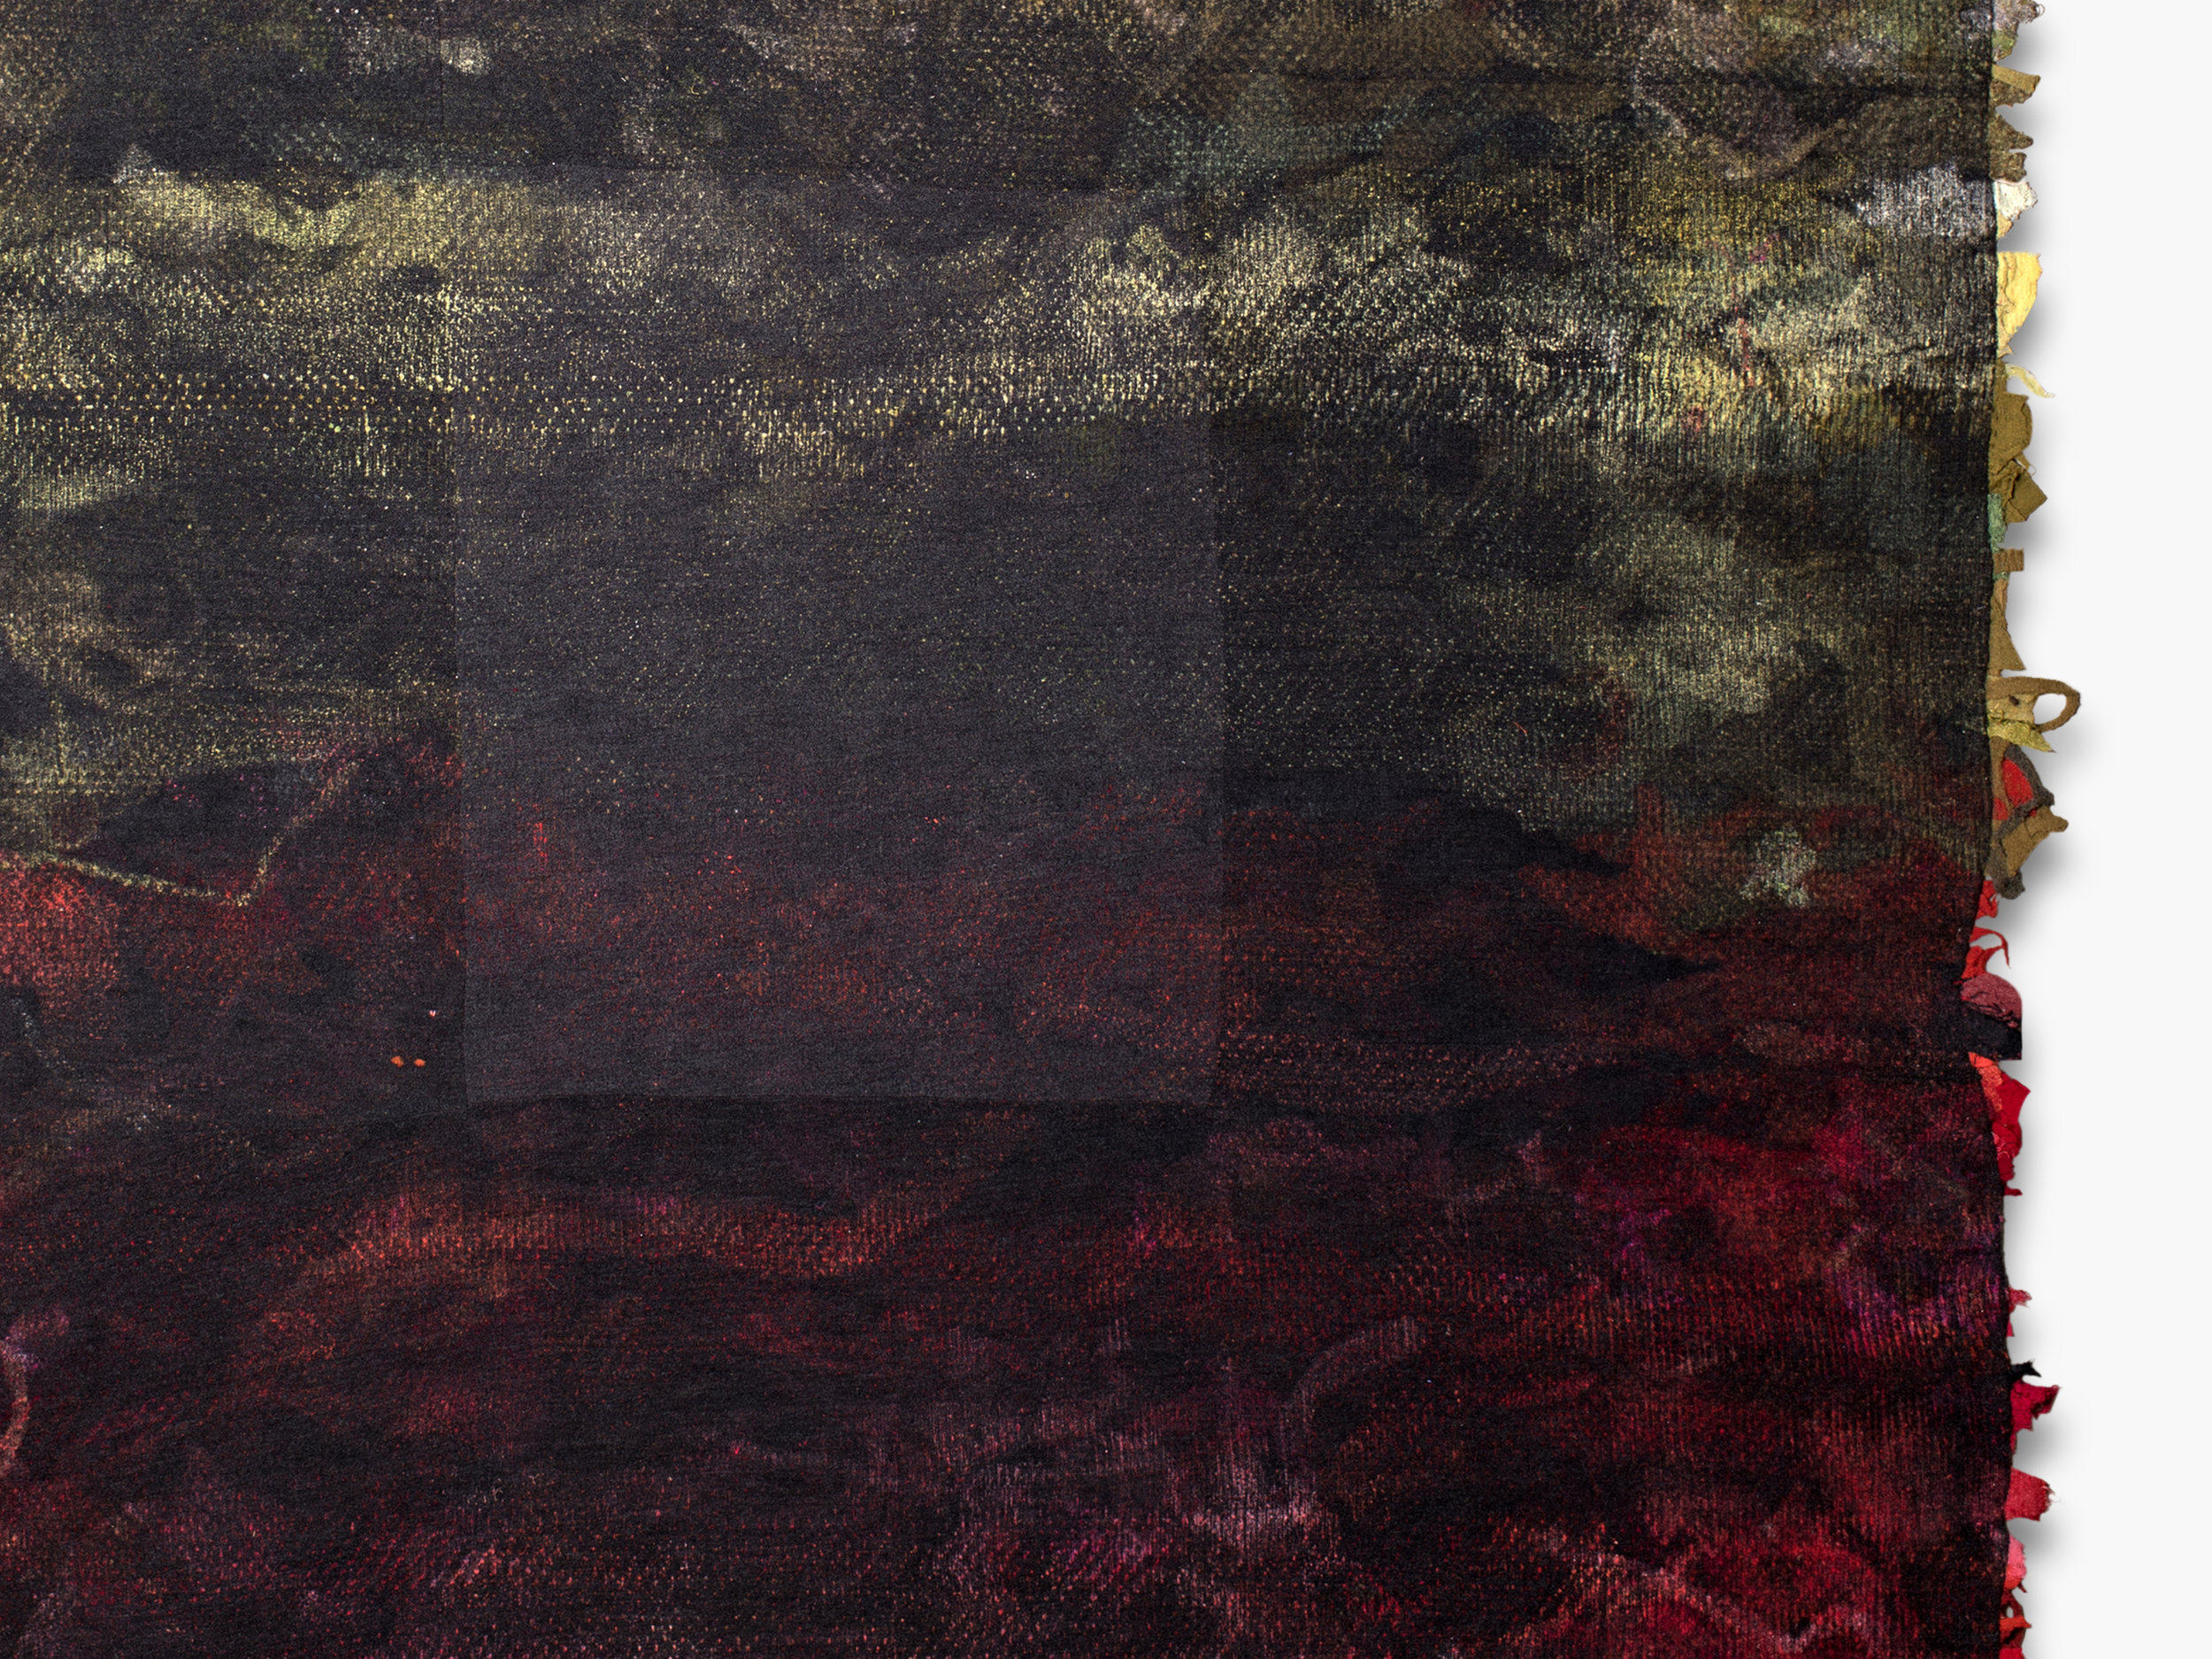 Digital-Rothko-Detail.jpg